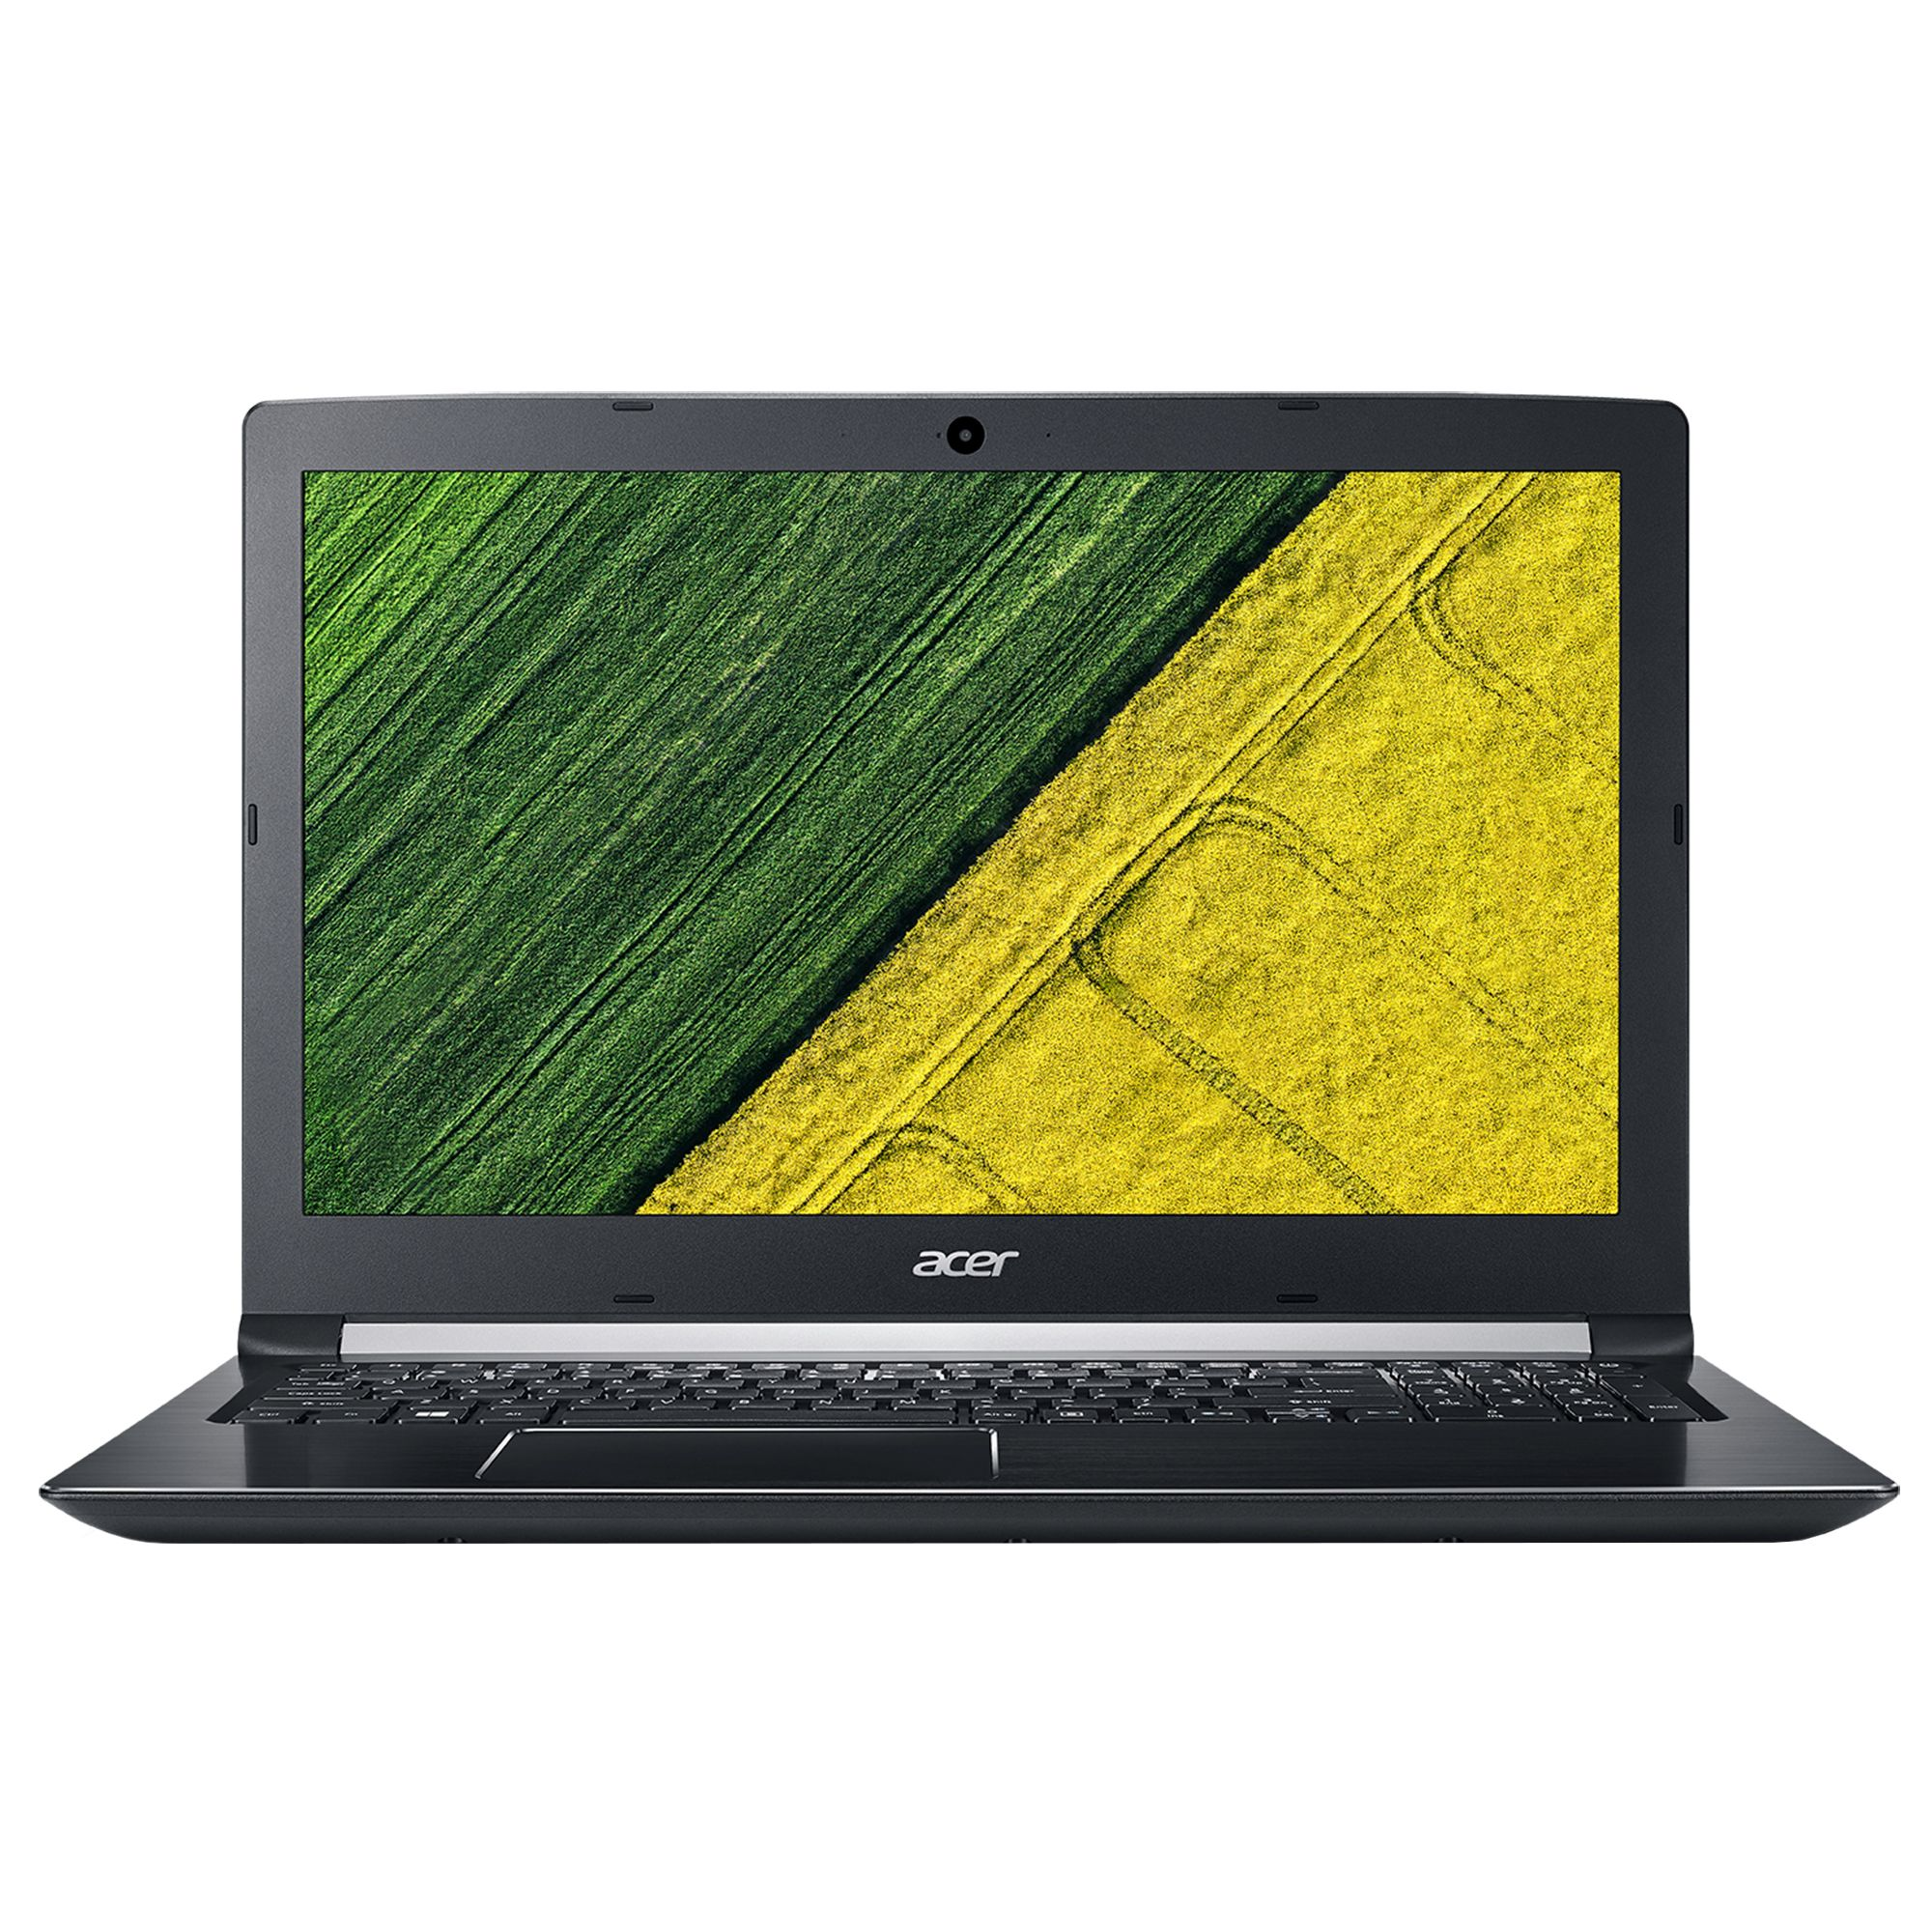 Notebook Acer Aspire A515 15.6 Full HD Intel Core i5-7200U MX150-2GB RAM 4GB HDD 1TB Linux Argintiu